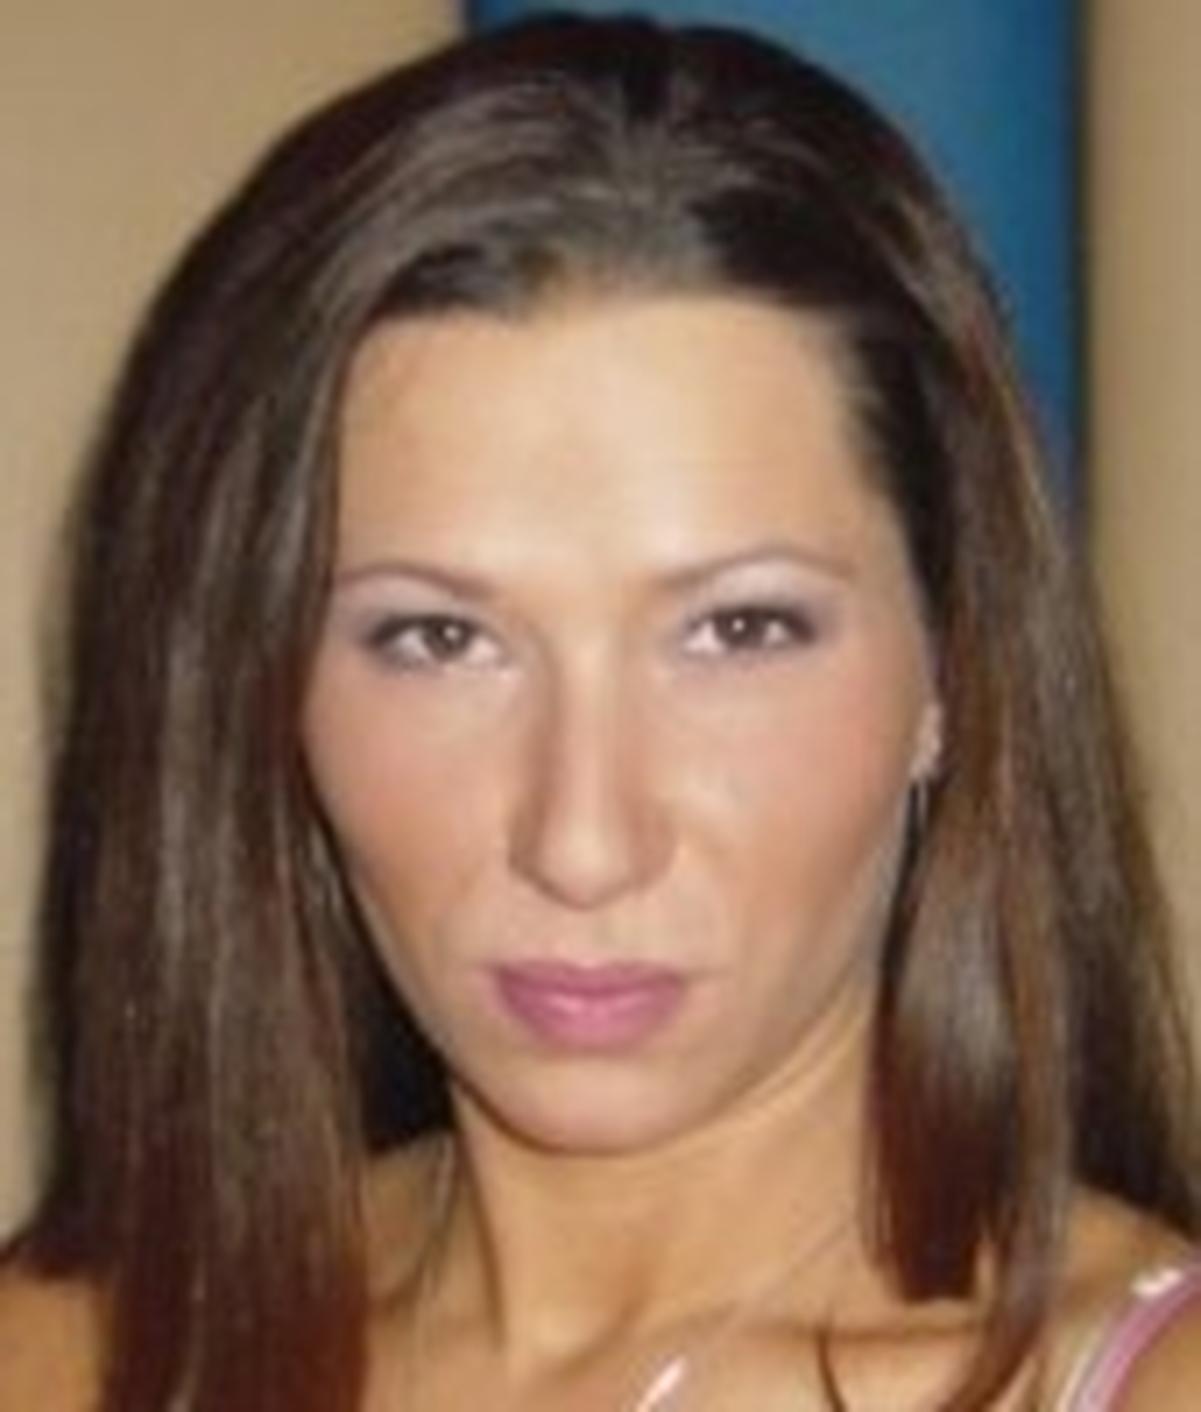 Alexandra Belle